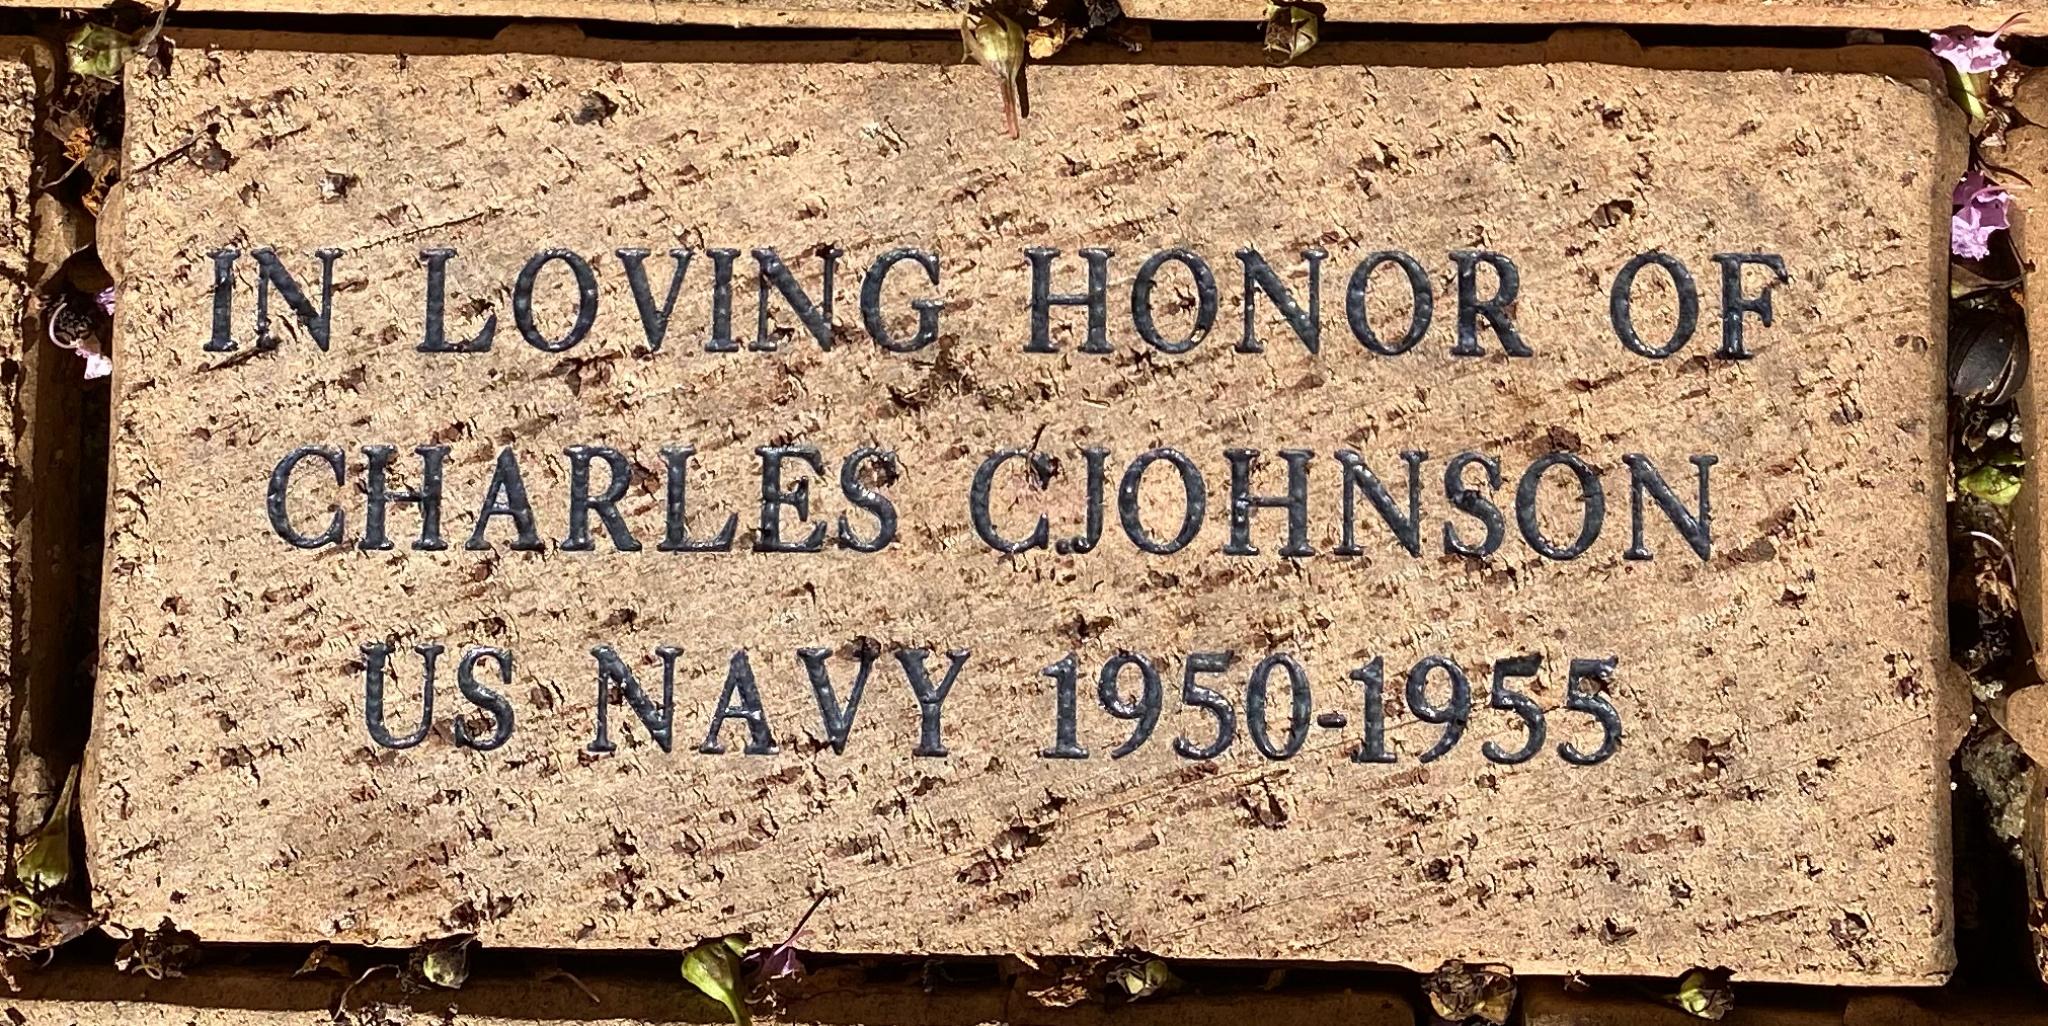 IN LOVING HONOR OF CHARLES C. JOHNSON US NAVY 1950-1955